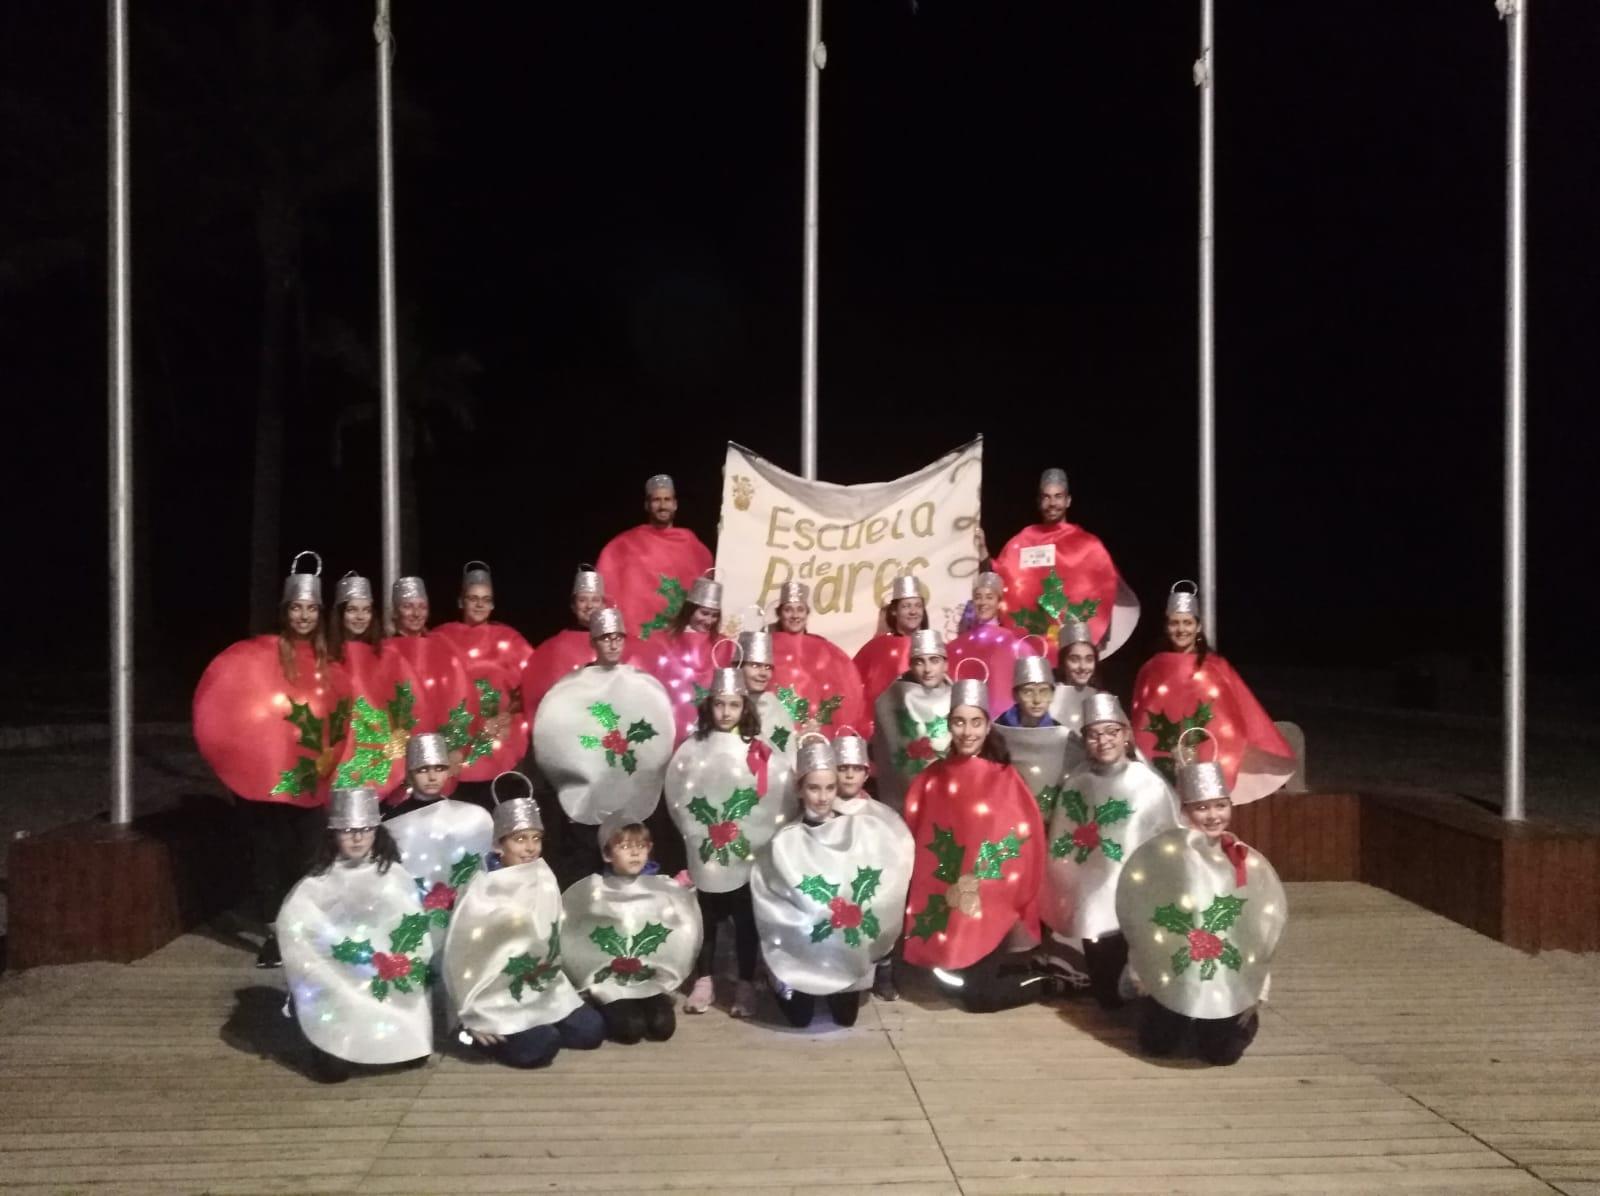 CORRER SIN MIEDO, PARTICIPANTES DE LA SAN SILVESTRE TORREÑA